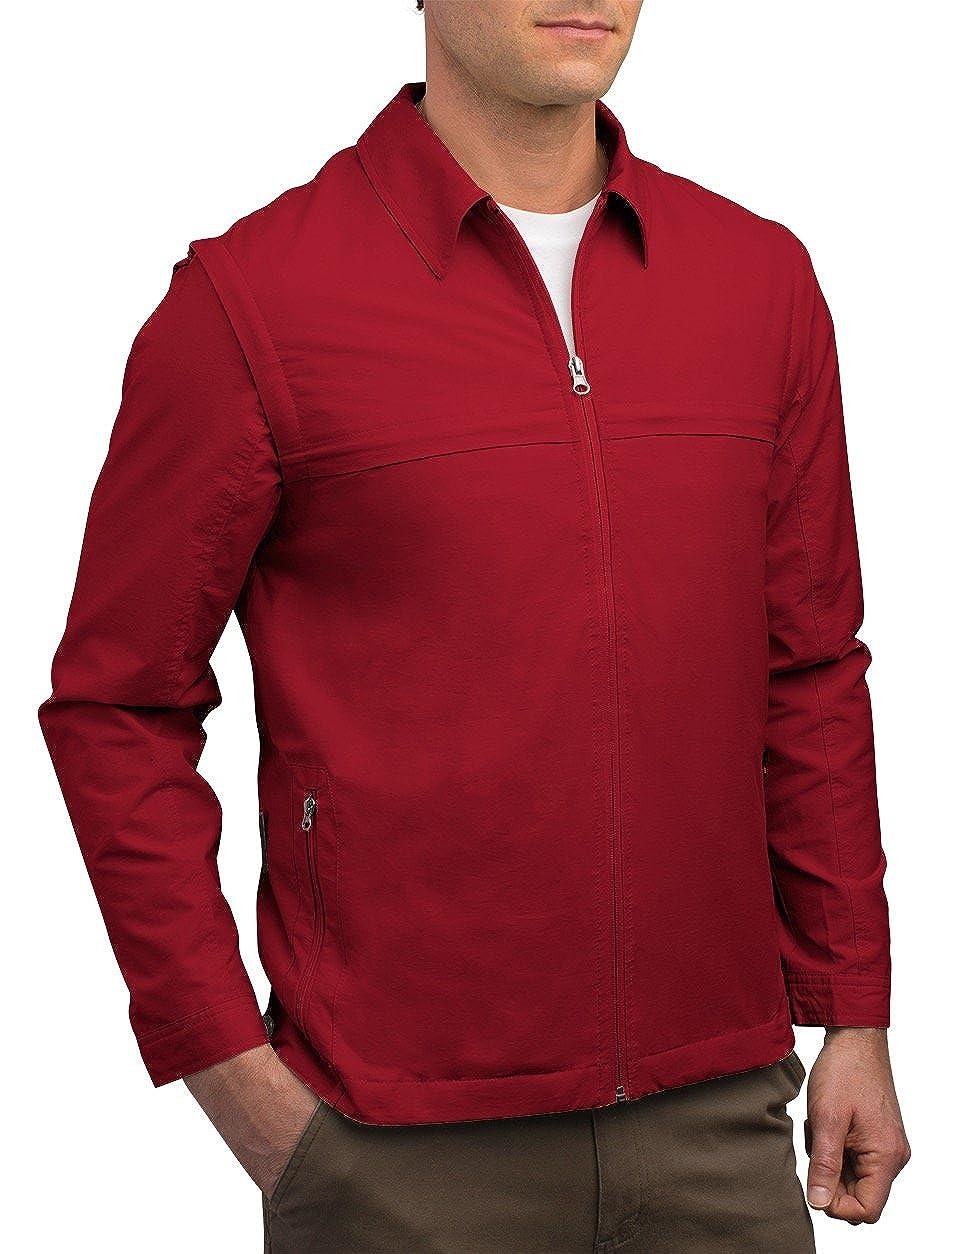 Men's SCOTTeVEST Jacket - 25 Pockets - Travel Clothing